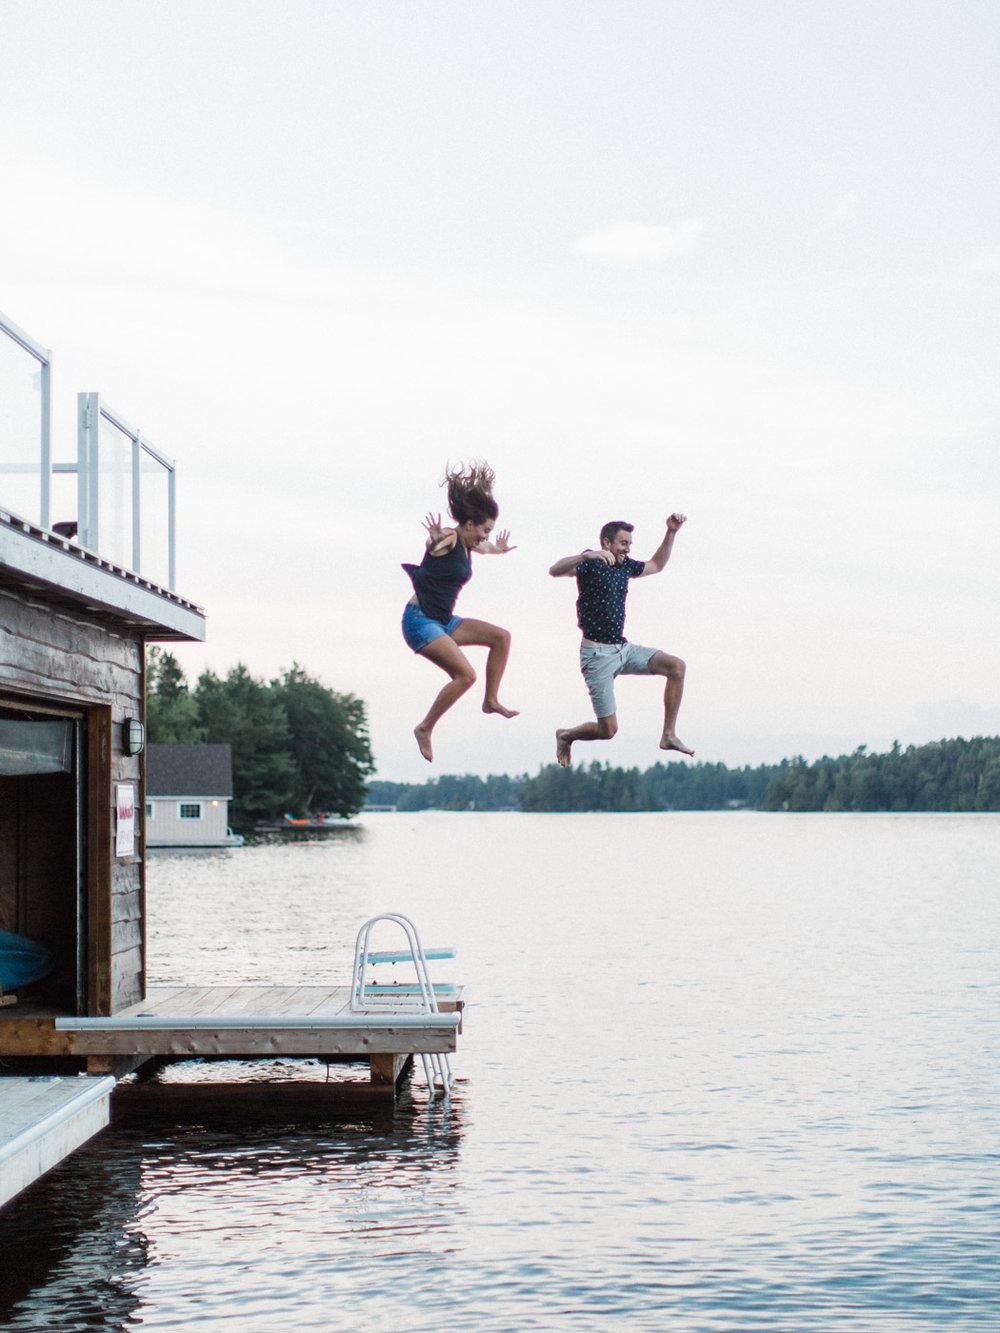 muskoka-wedding-photographer-adventurous-couples-engagement-session-lake-110.jpg